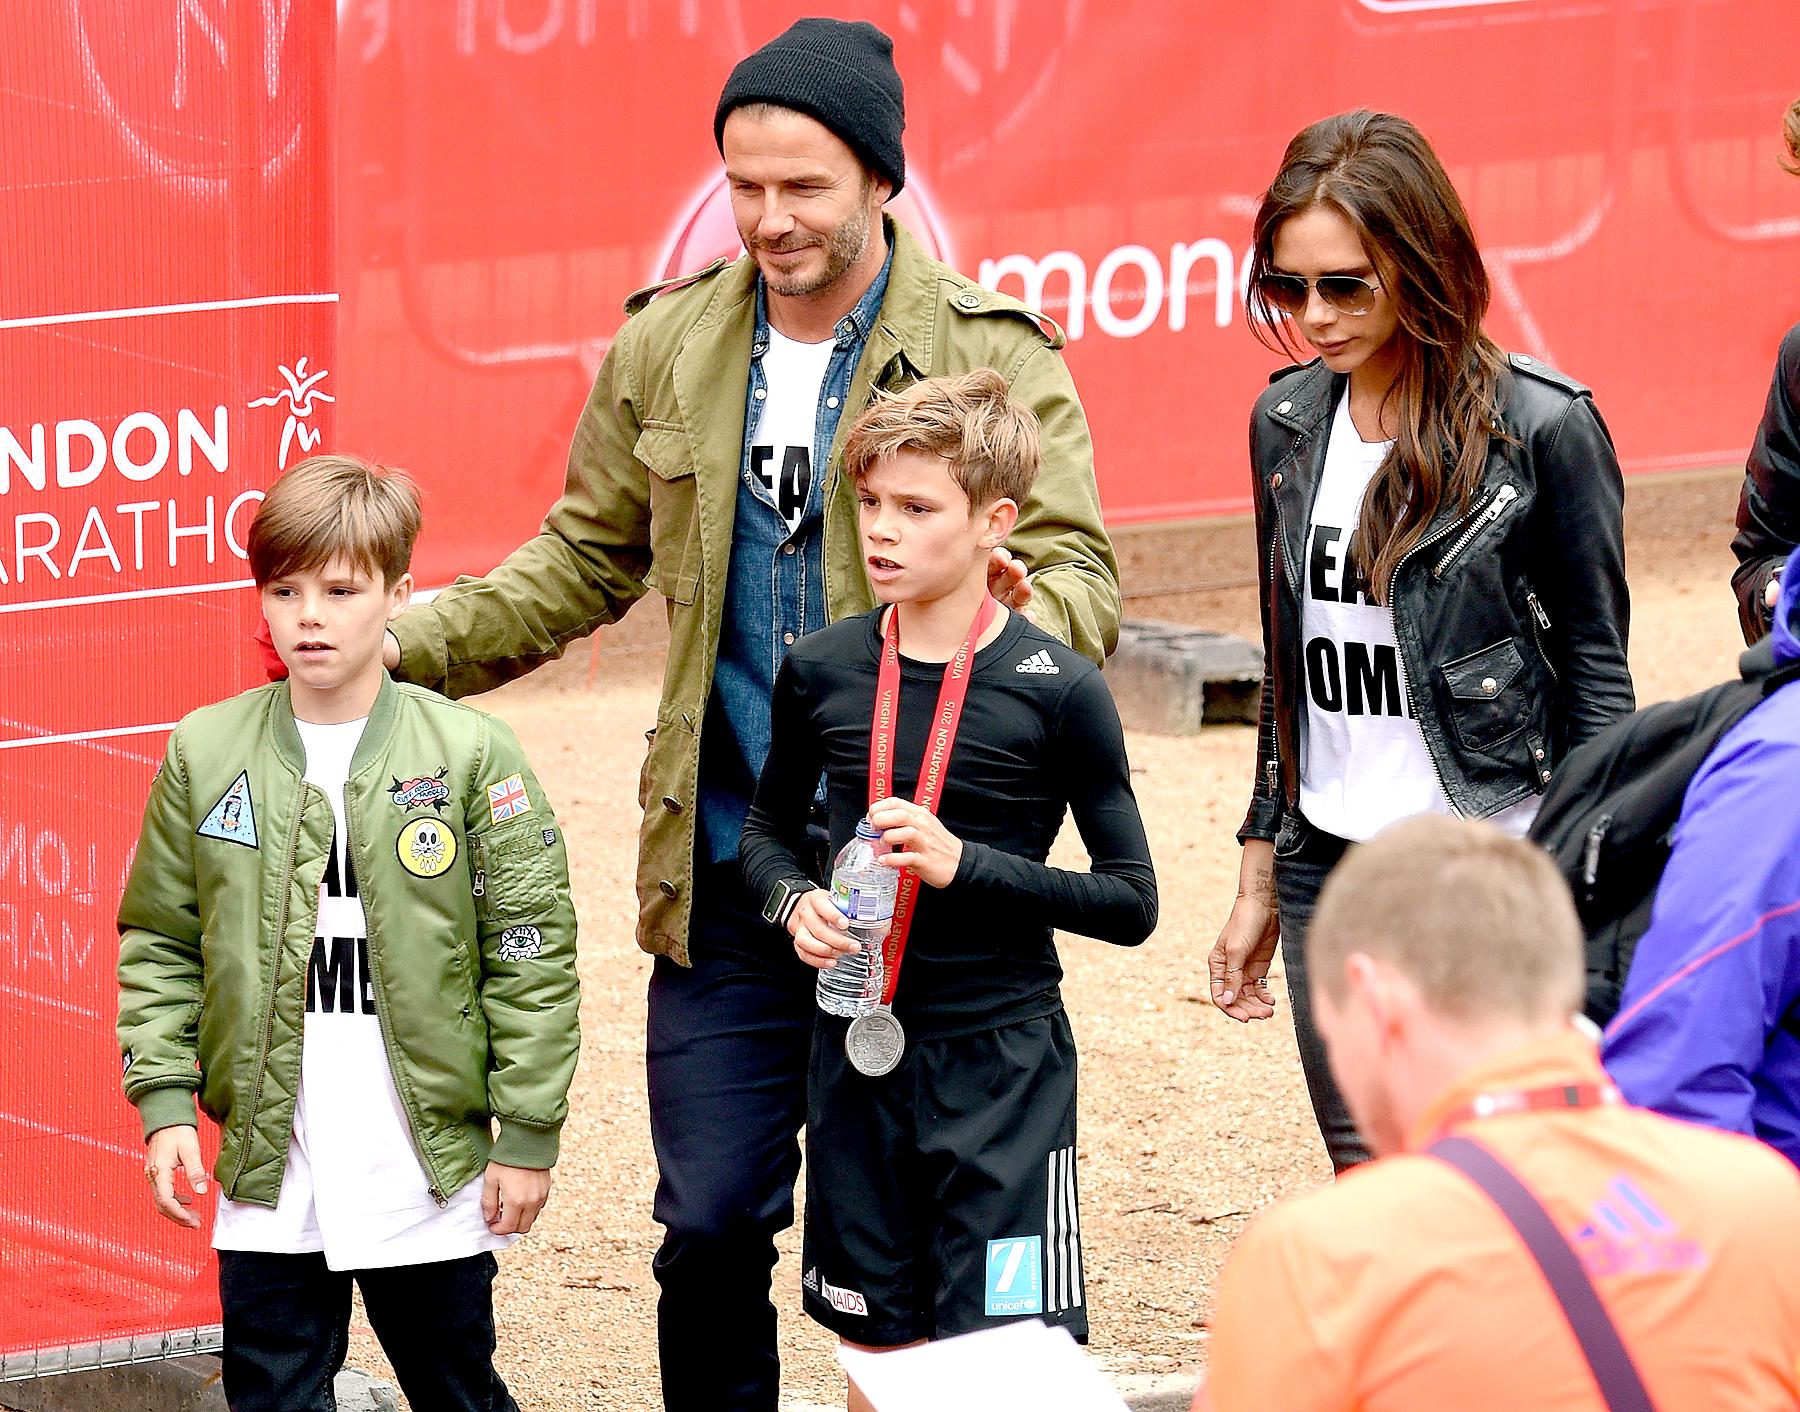 Cruz Beckham, David Beckham and Victoria Beckham congratulate Romeo Beckham after he finished the Childrns Marathon during the London Marathon on April 26, 2015 in London, England.